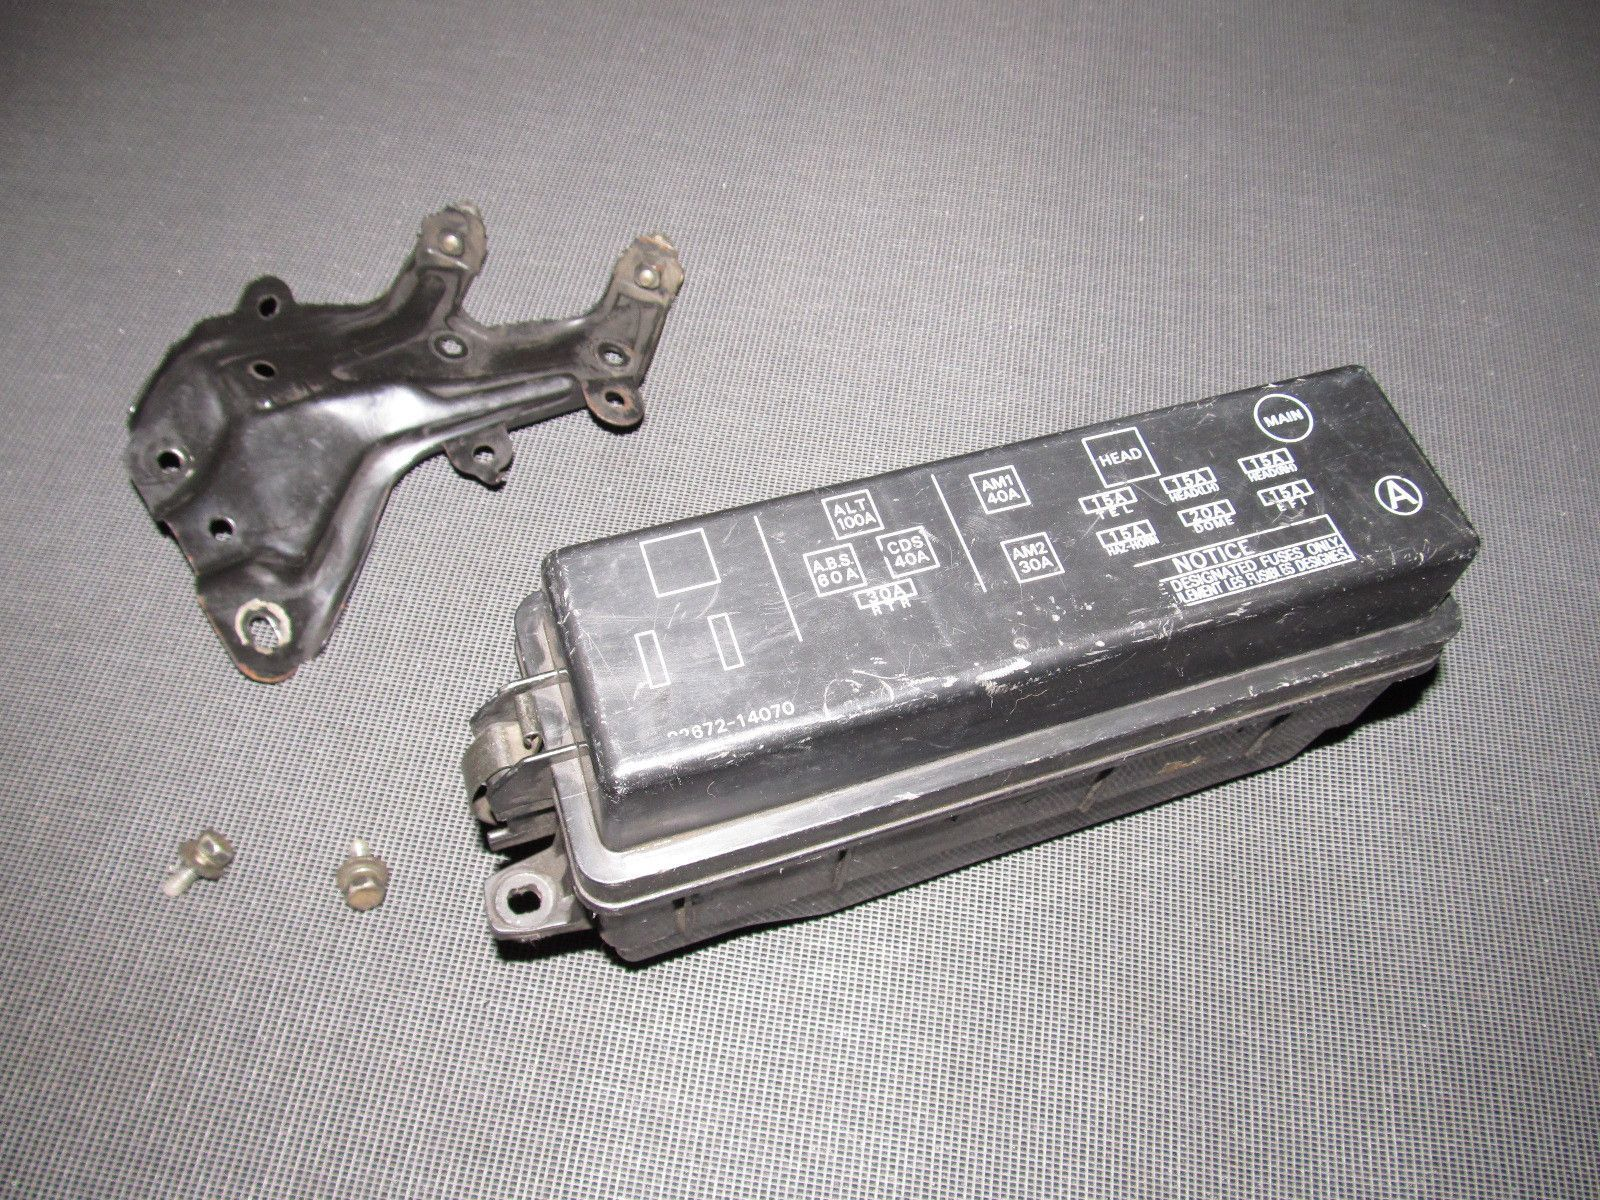 89 90 91 92 toyota supra oem engine fuse box [ 1600 x 1200 Pixel ]